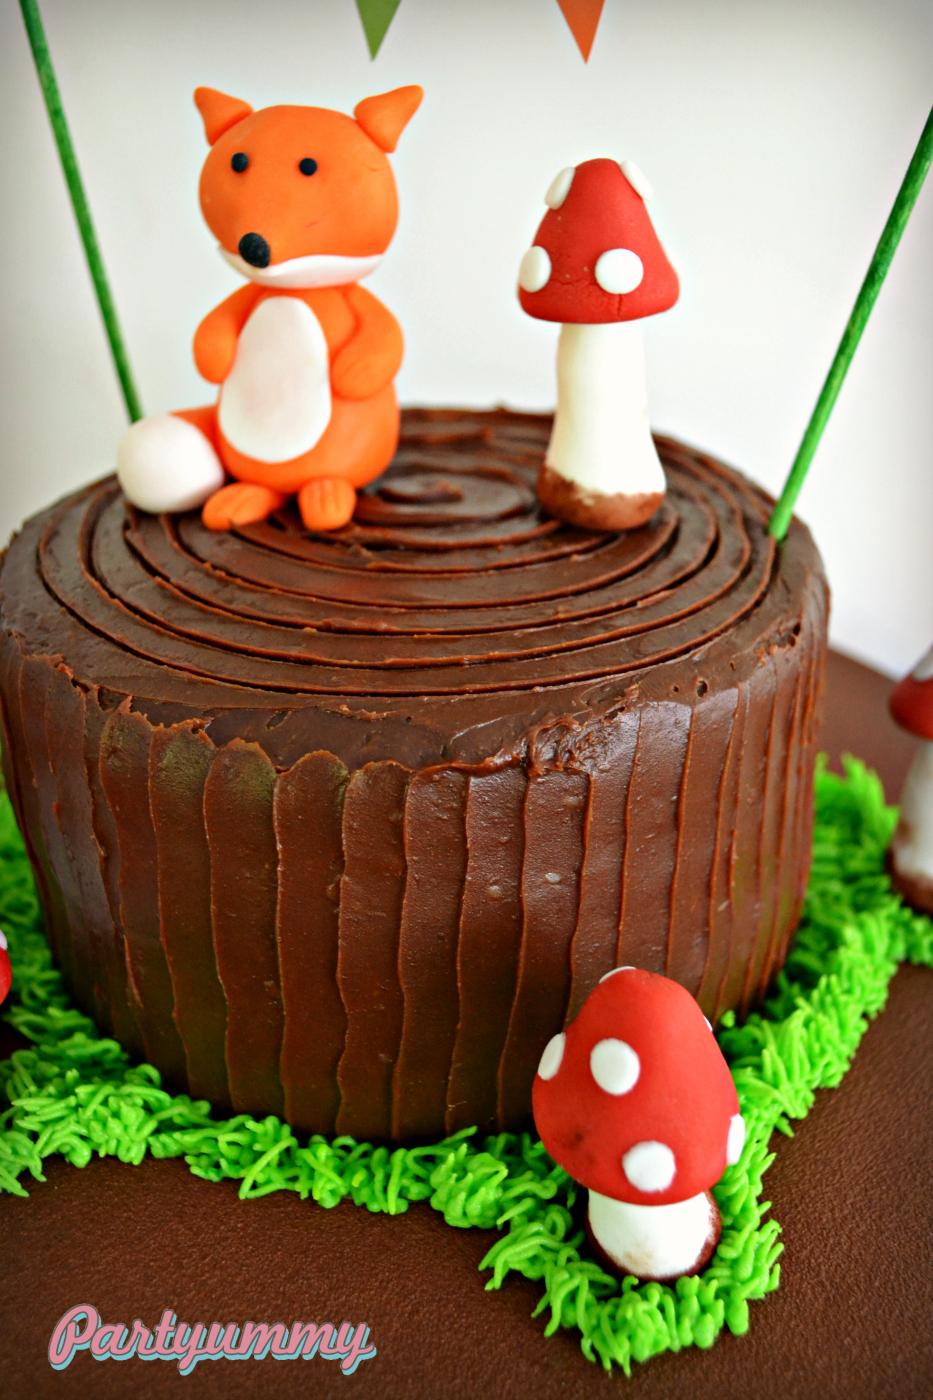 gateau-animaux-foret-renard-woodland-cake-fox-2